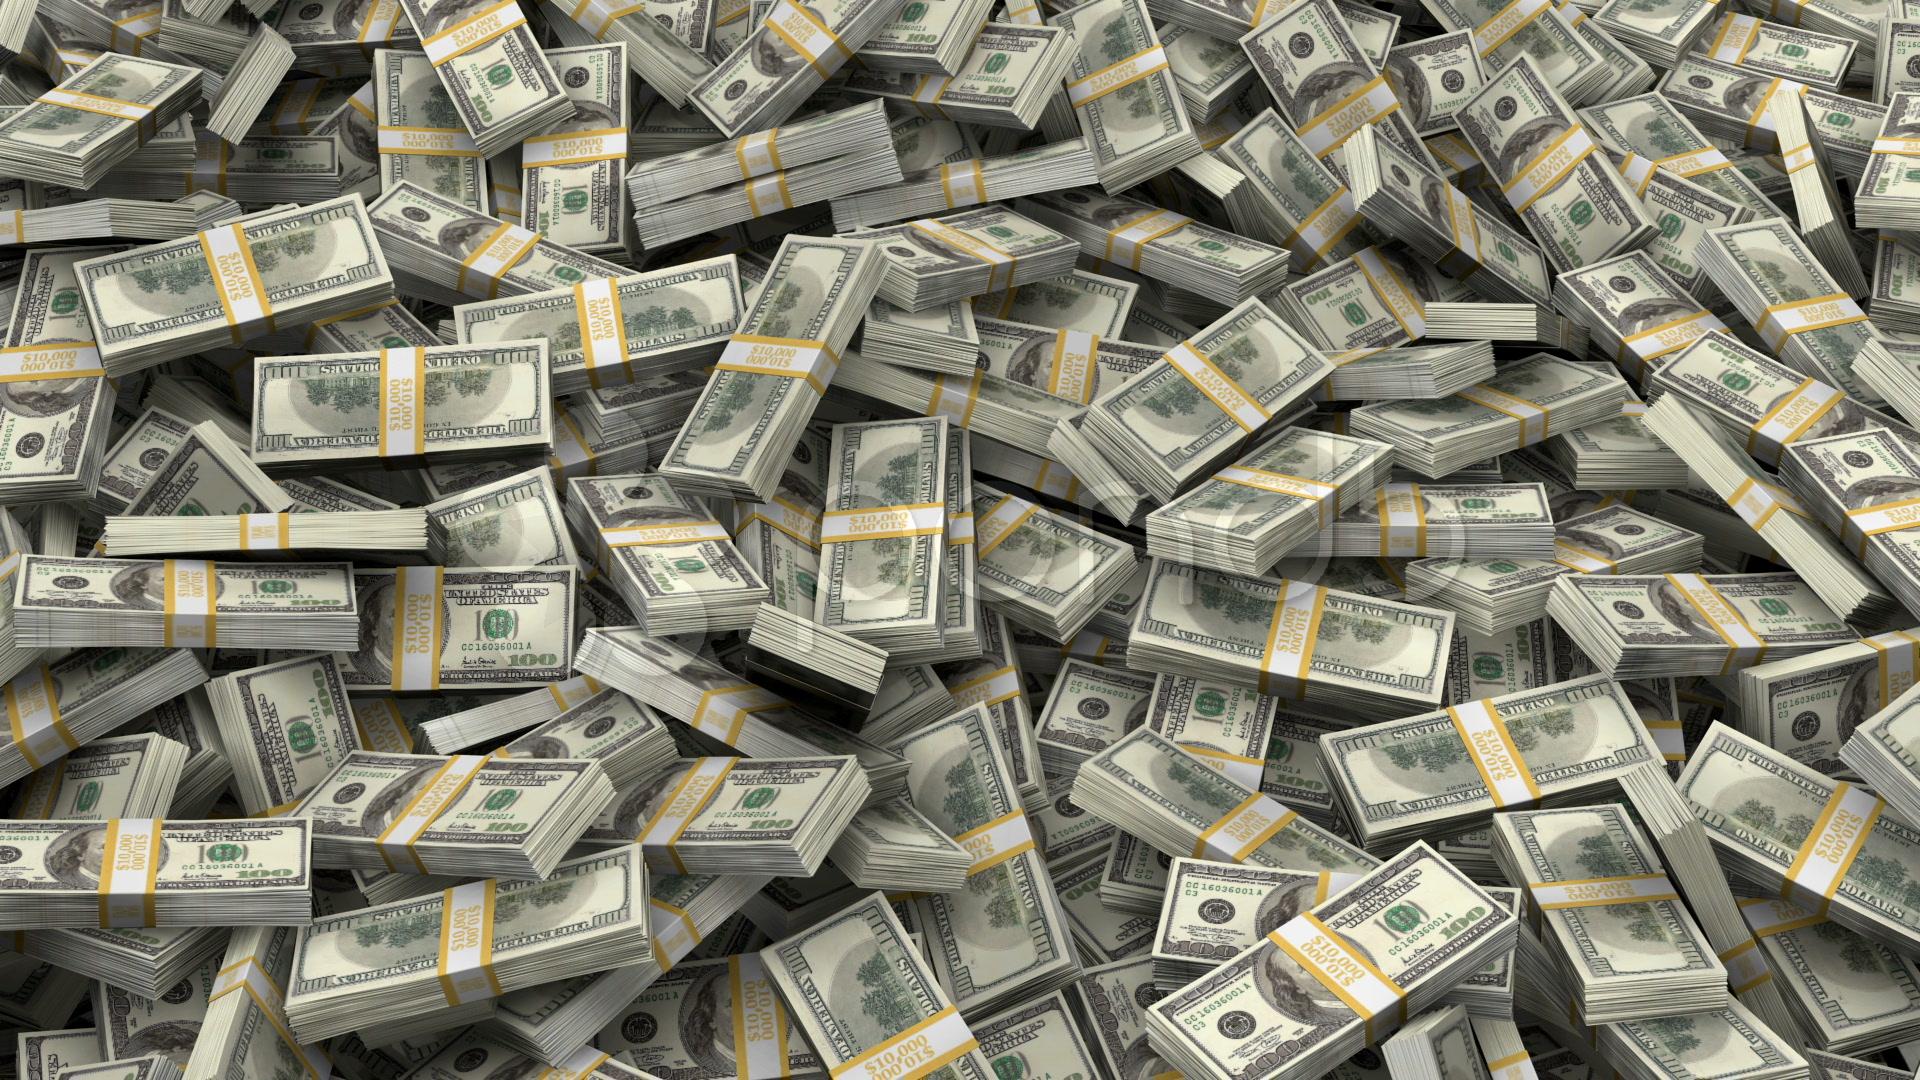 Money Stacks Wallpaper 1920x1080